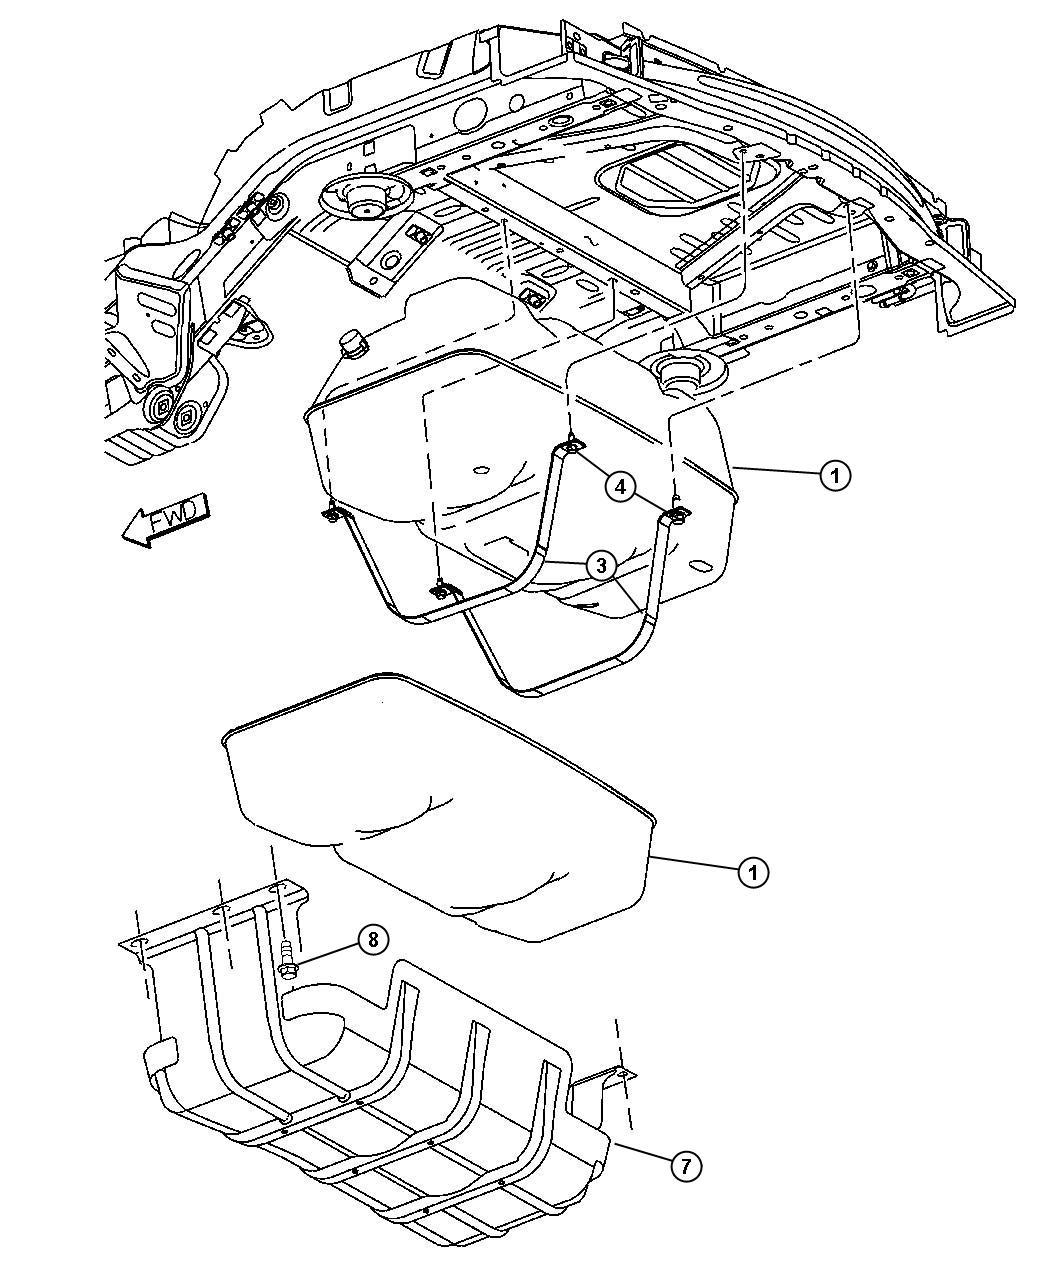 Jeep Liberty Strap Fuel Tank